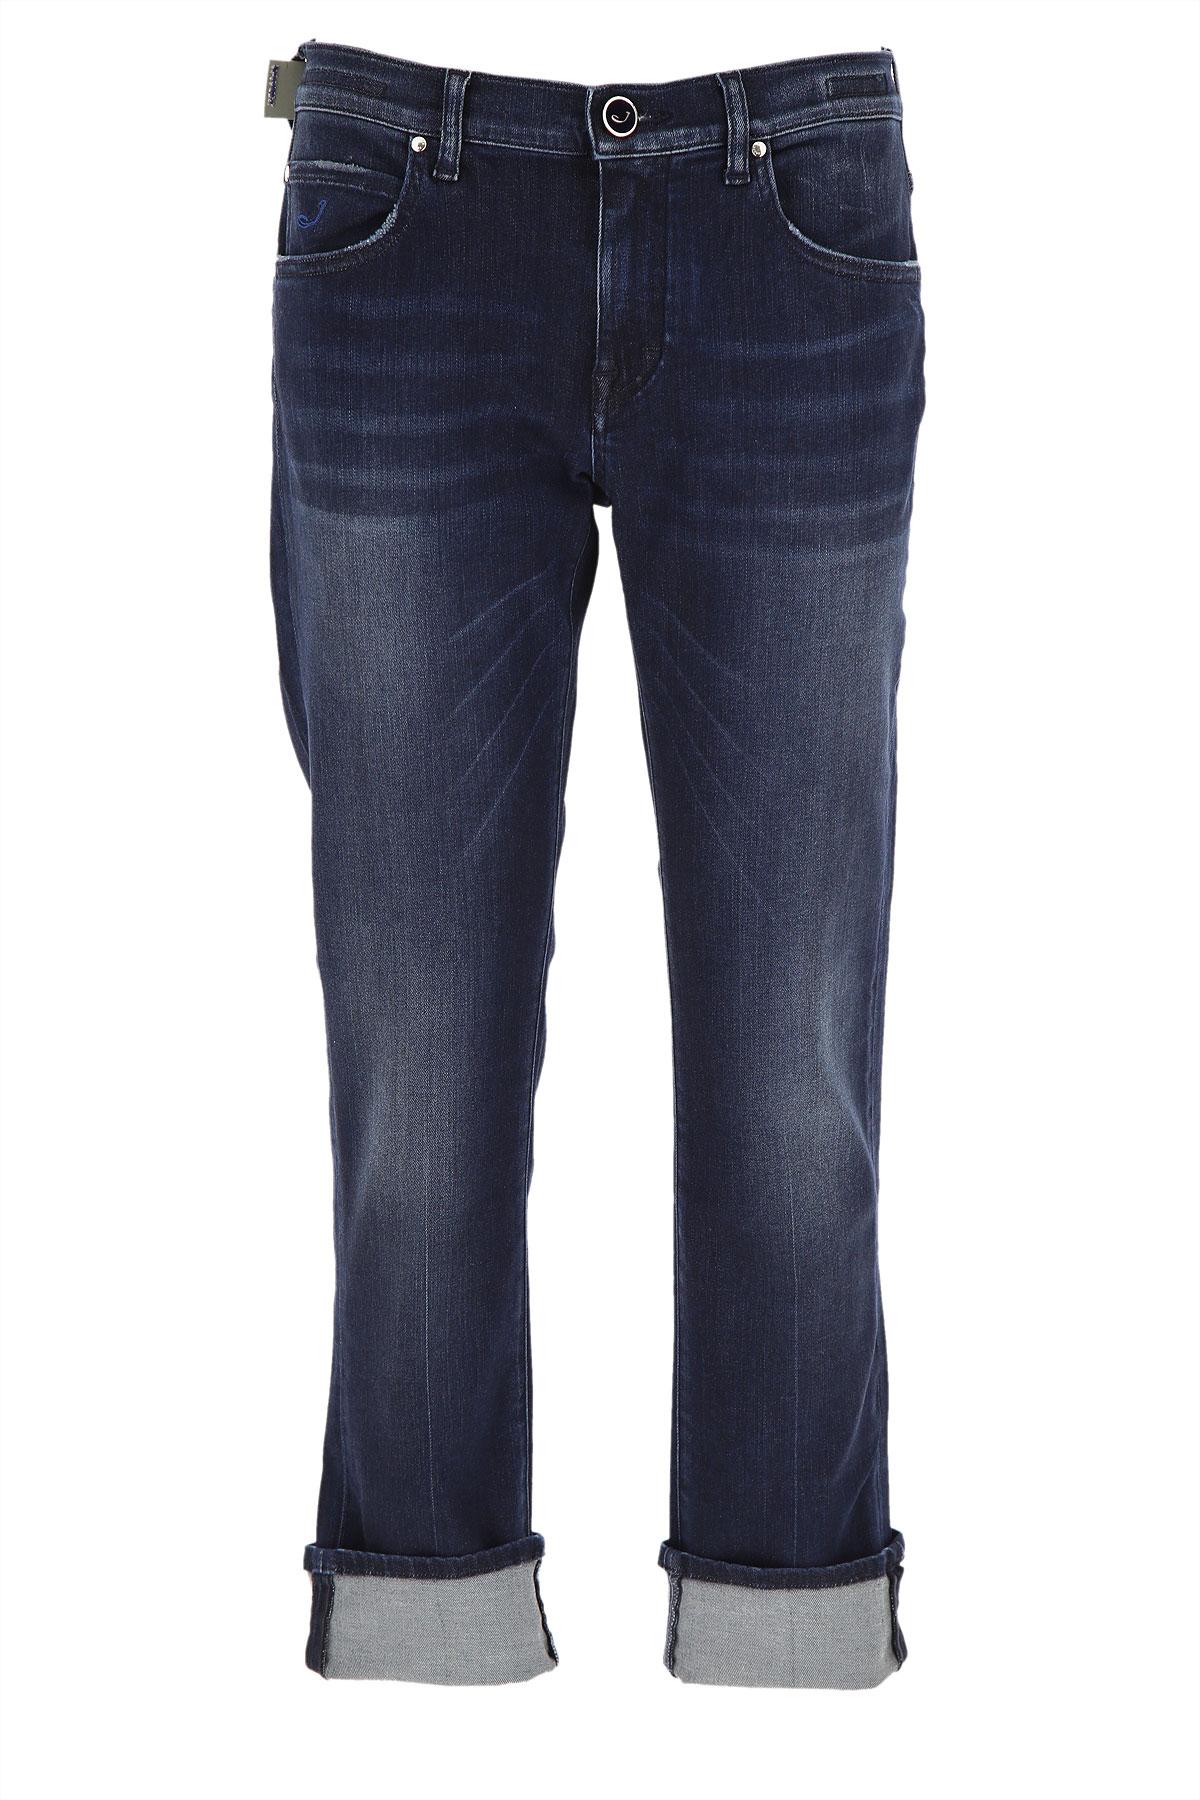 Jacob Cohen Jeans On Sale, Dark Blue Denim, Viscose, 2019, 25 26 27 28 29 30 31 32